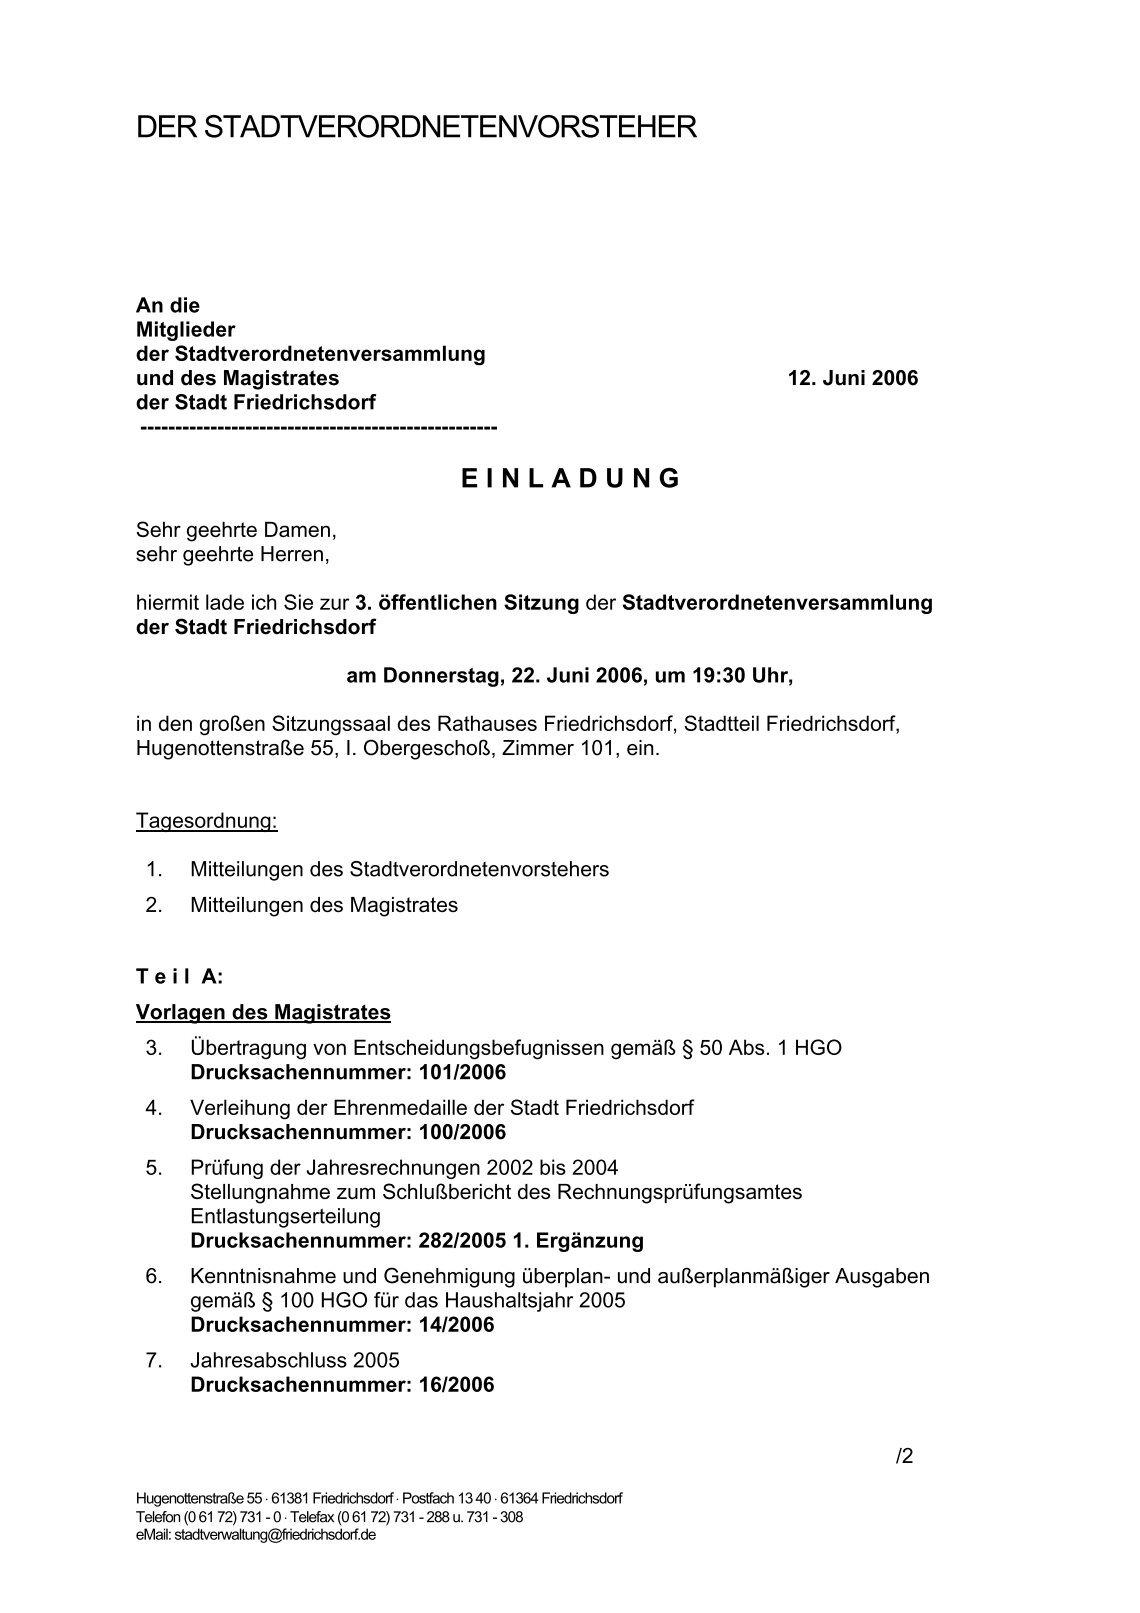 Großzügig Sterbeurkunde Vorlage Bilder - Entry Level Resume Vorlagen ...